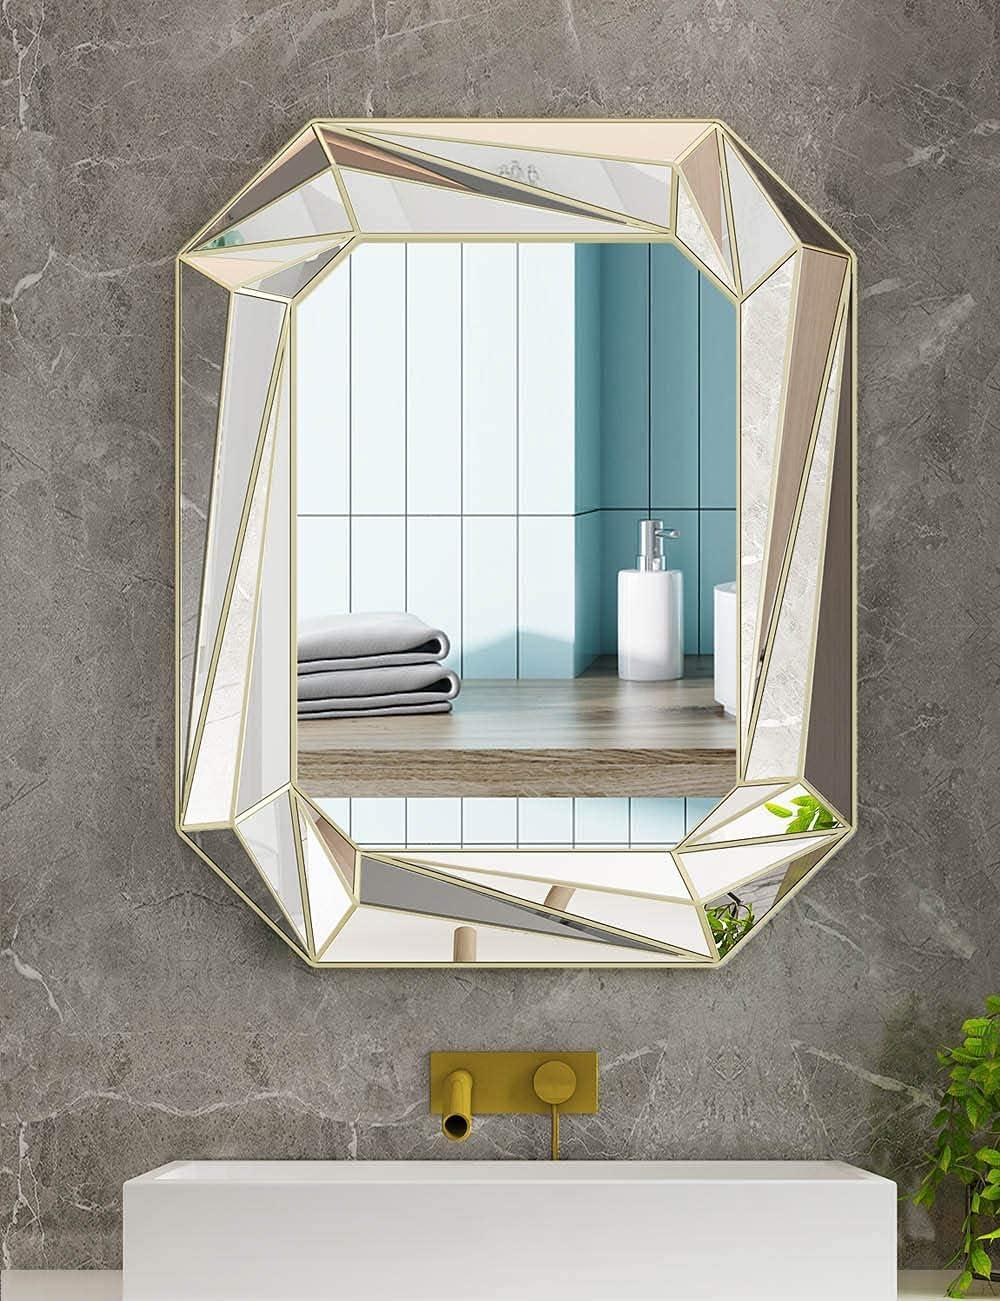 Modern Geometric Wall Mirror Art,Silver Mirror Wall Decor Wall-Mounted Mirrors for Bathroom,Bedroom,Living, Dining Room,24x30 inch